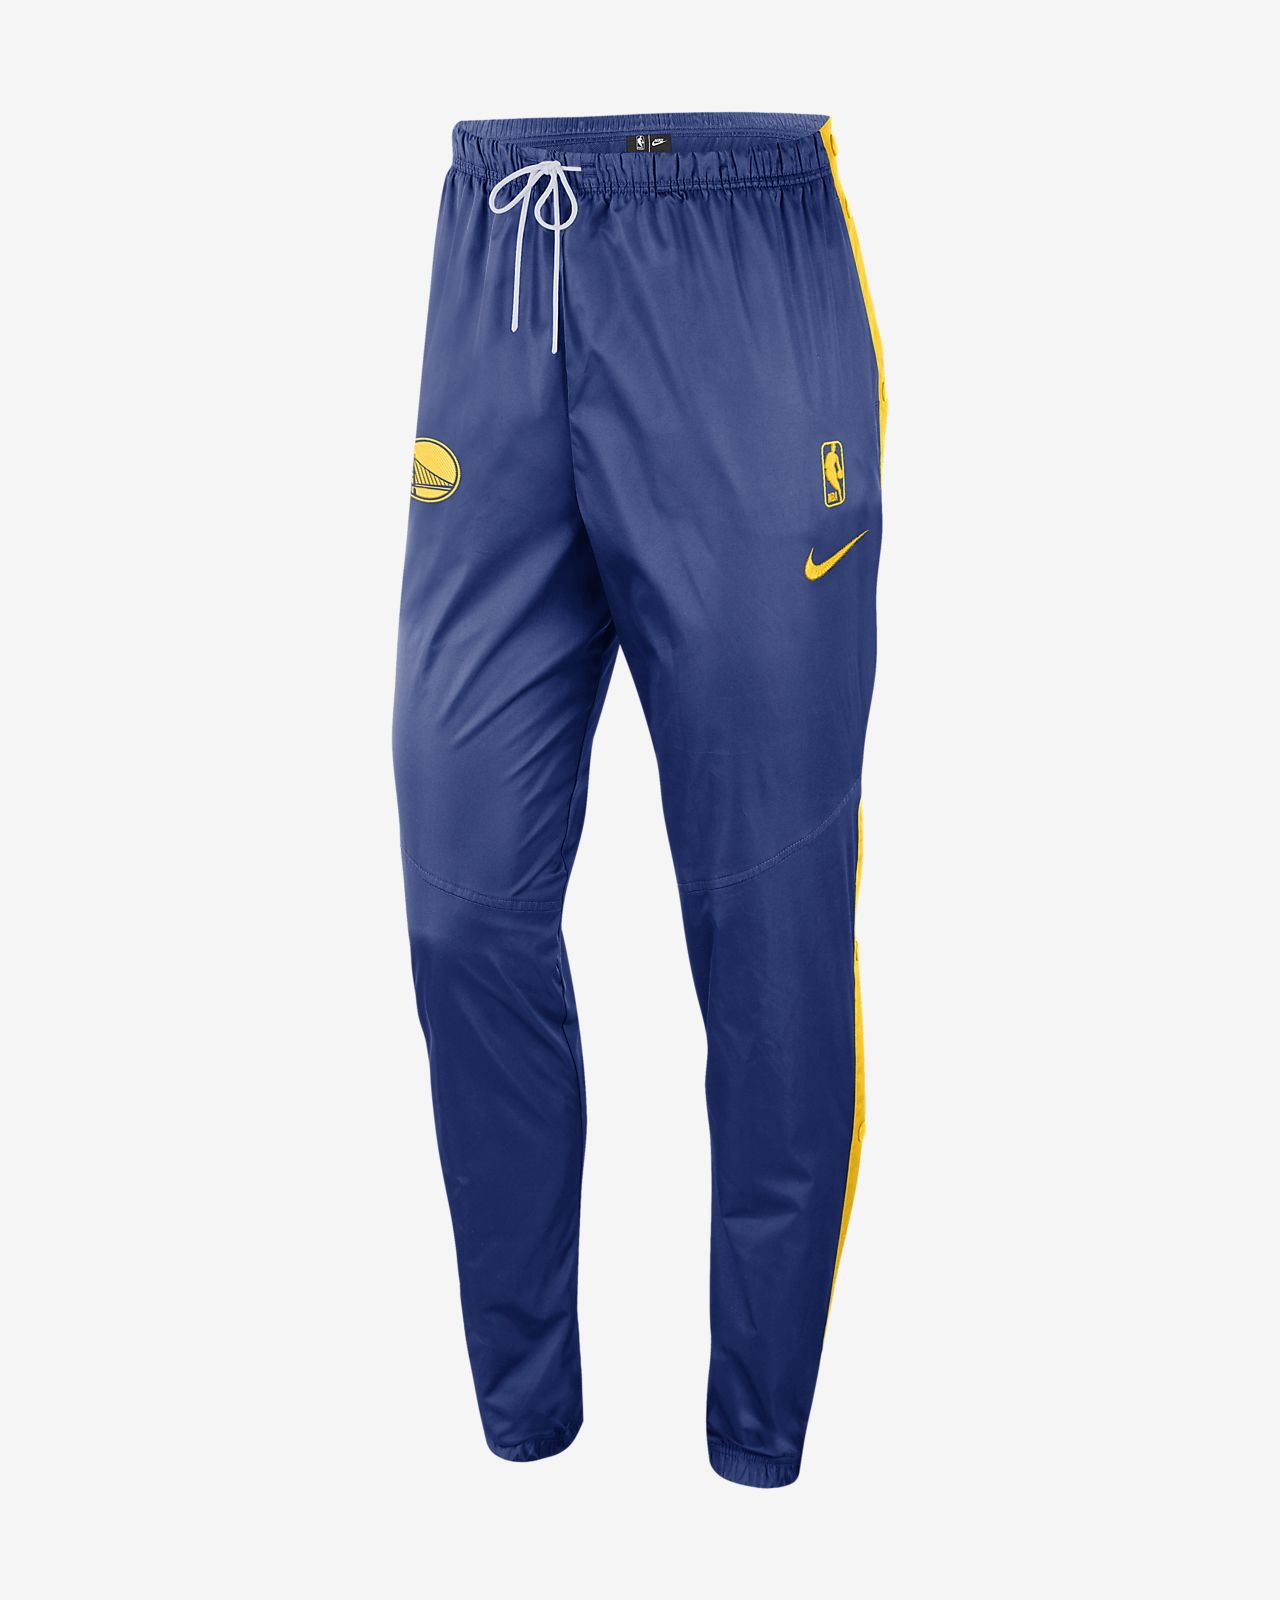 Byxor Golden State Warriors Nike Modern NBA för kvinnor